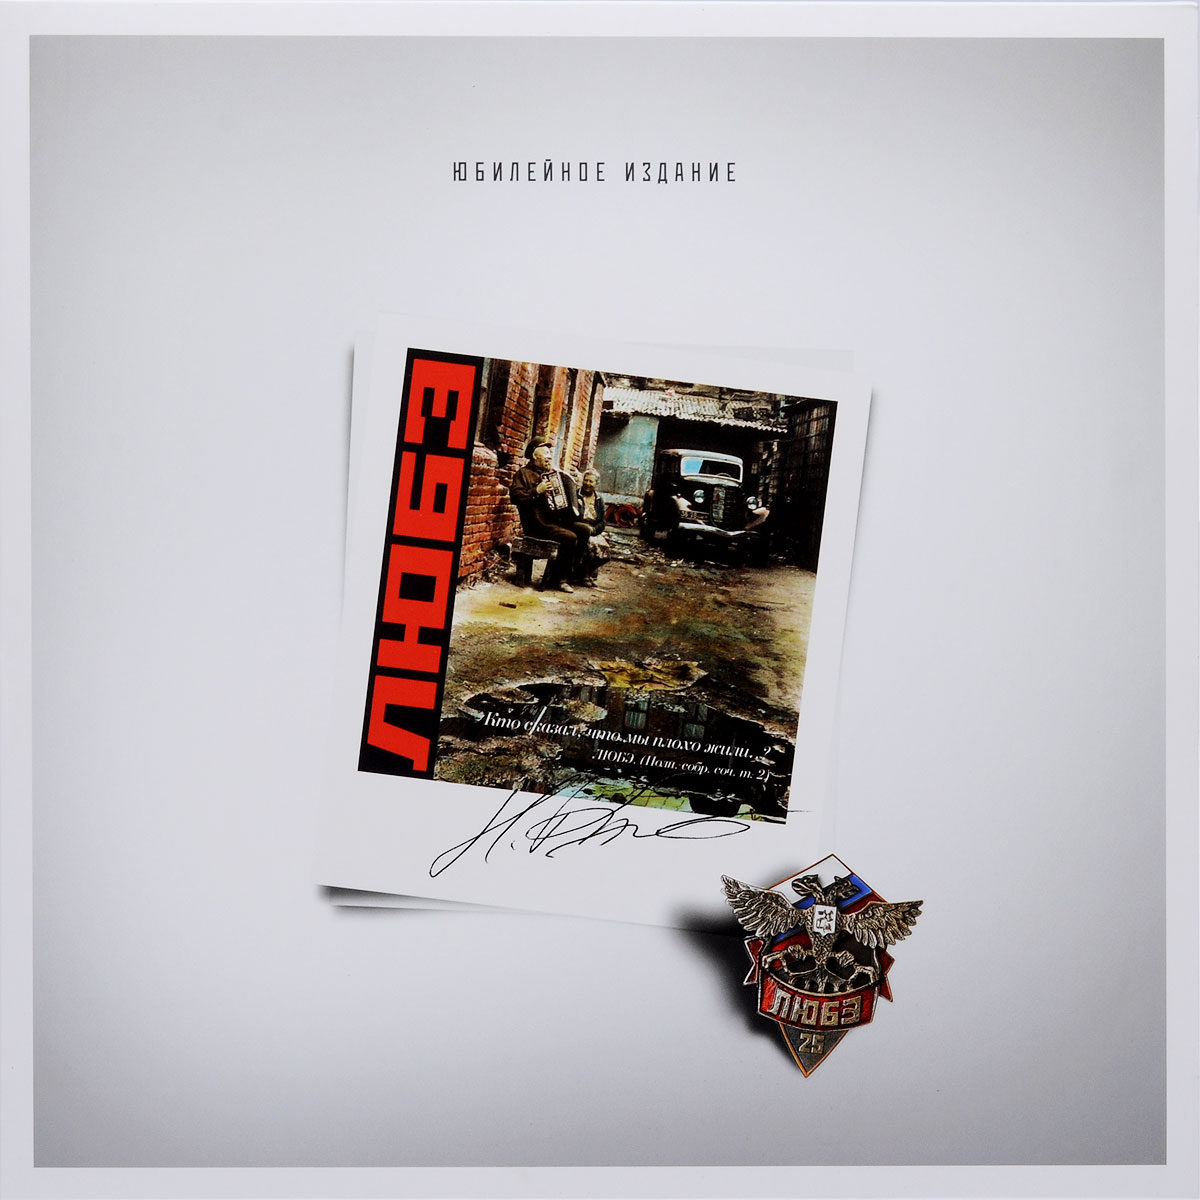 LP 1:Tracks 1 - 6 LP 2:Tracks 7 - 10